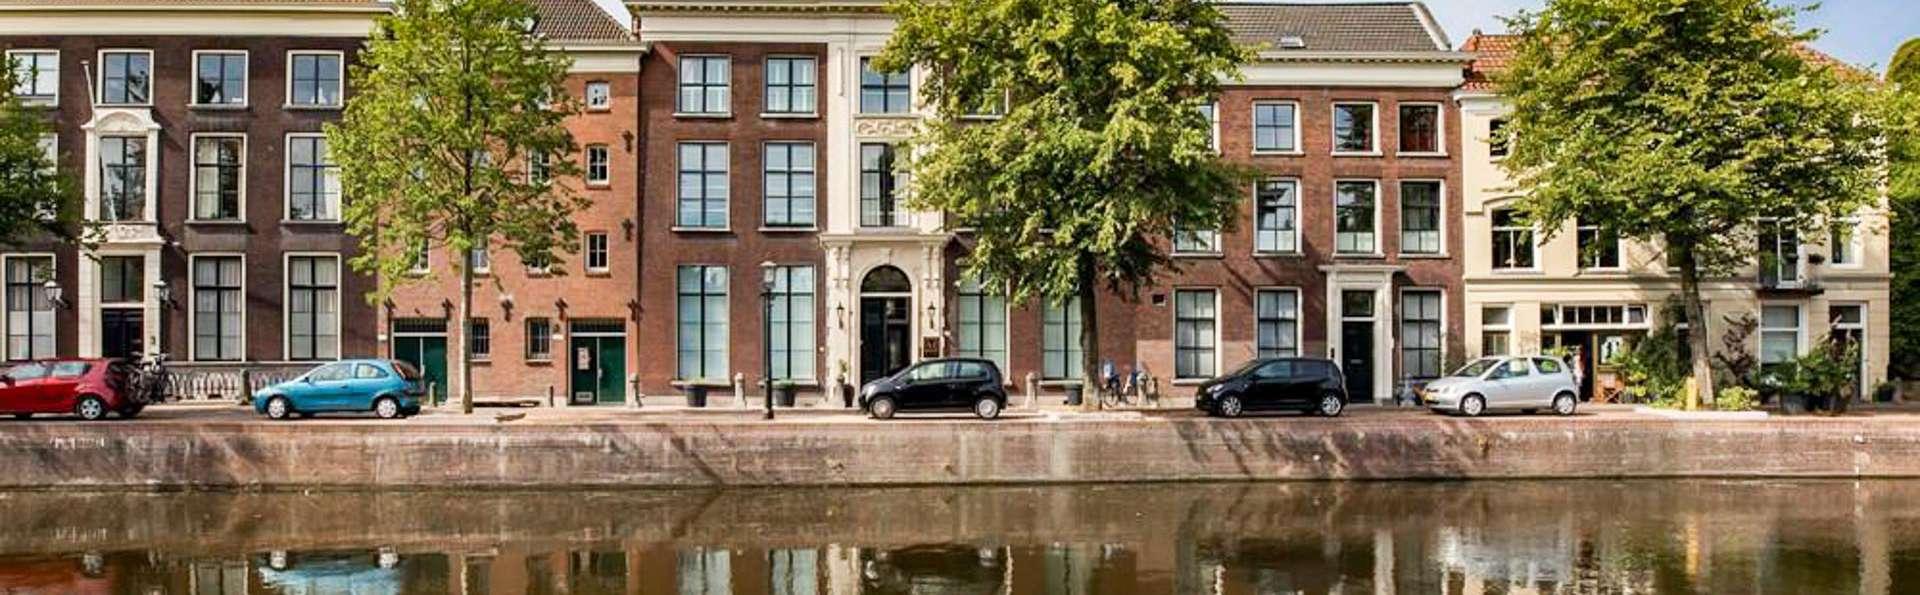 Stadsvilla Hotel Mozaic Den Haag - EDIT_NEW_SURROUNDING_04.jpg